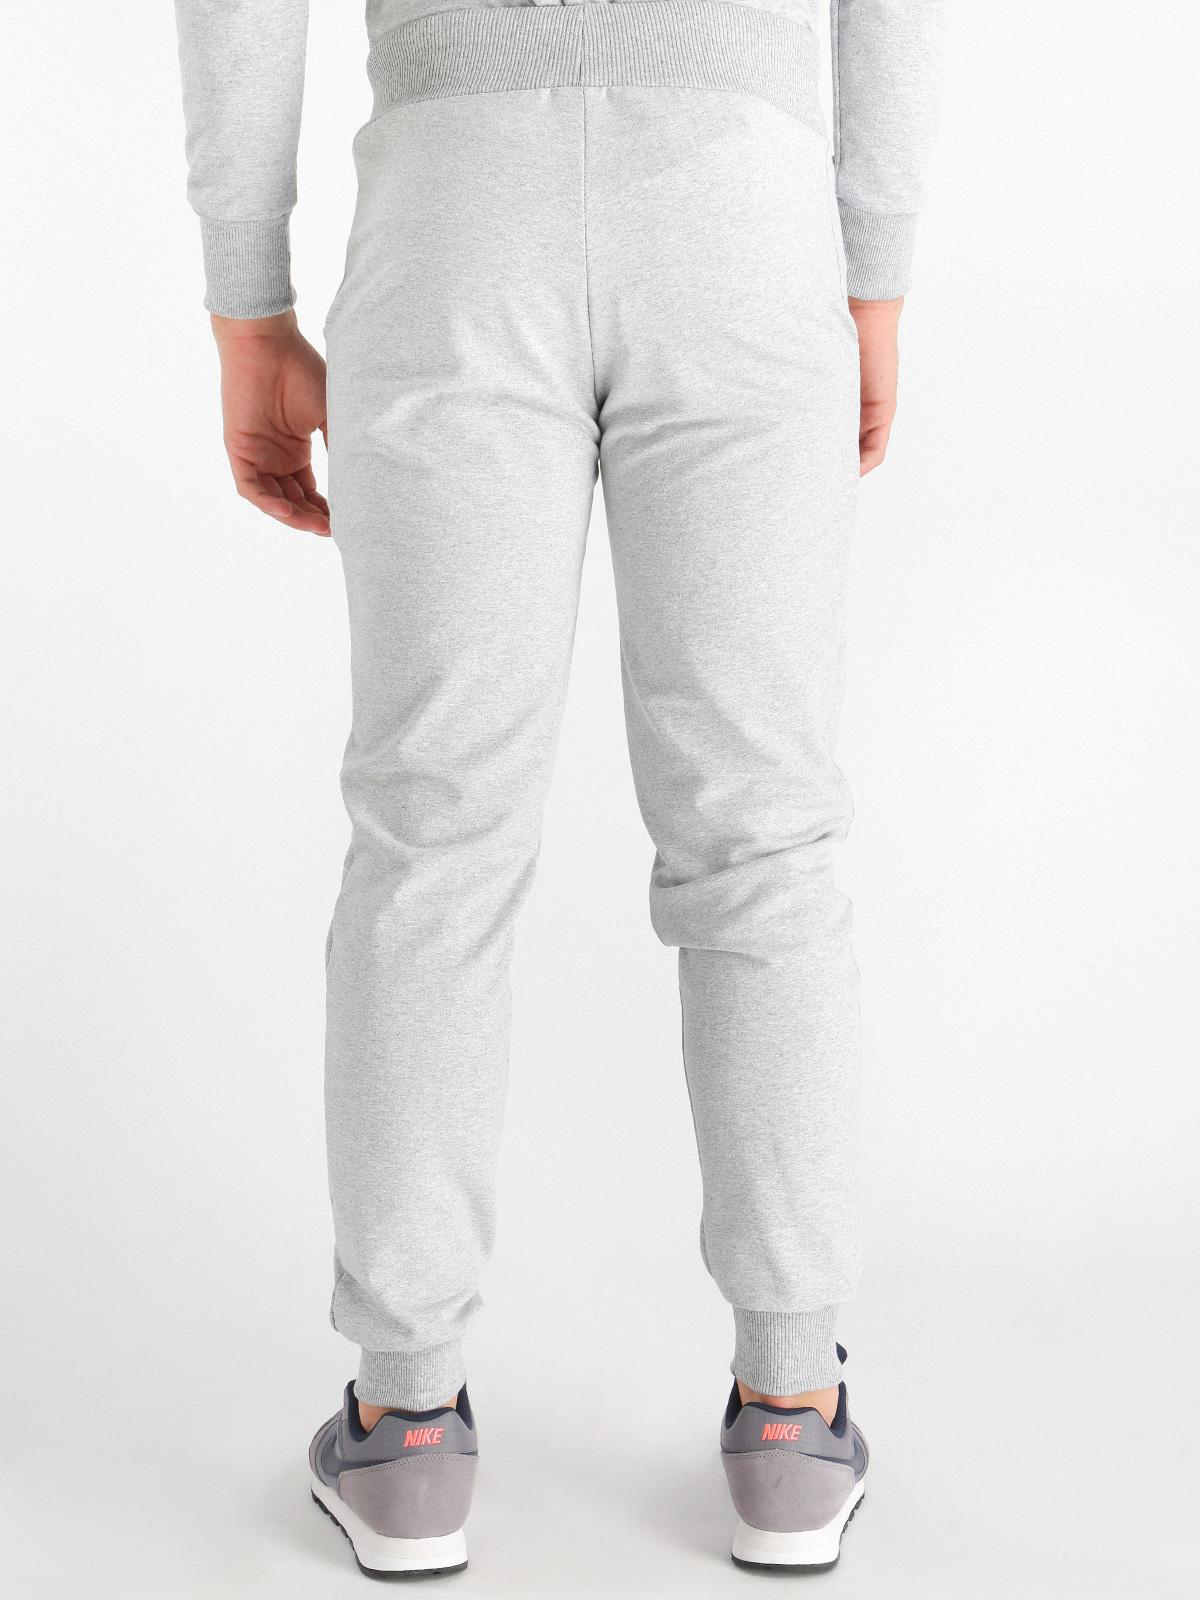 pantaloni nike banda laterale